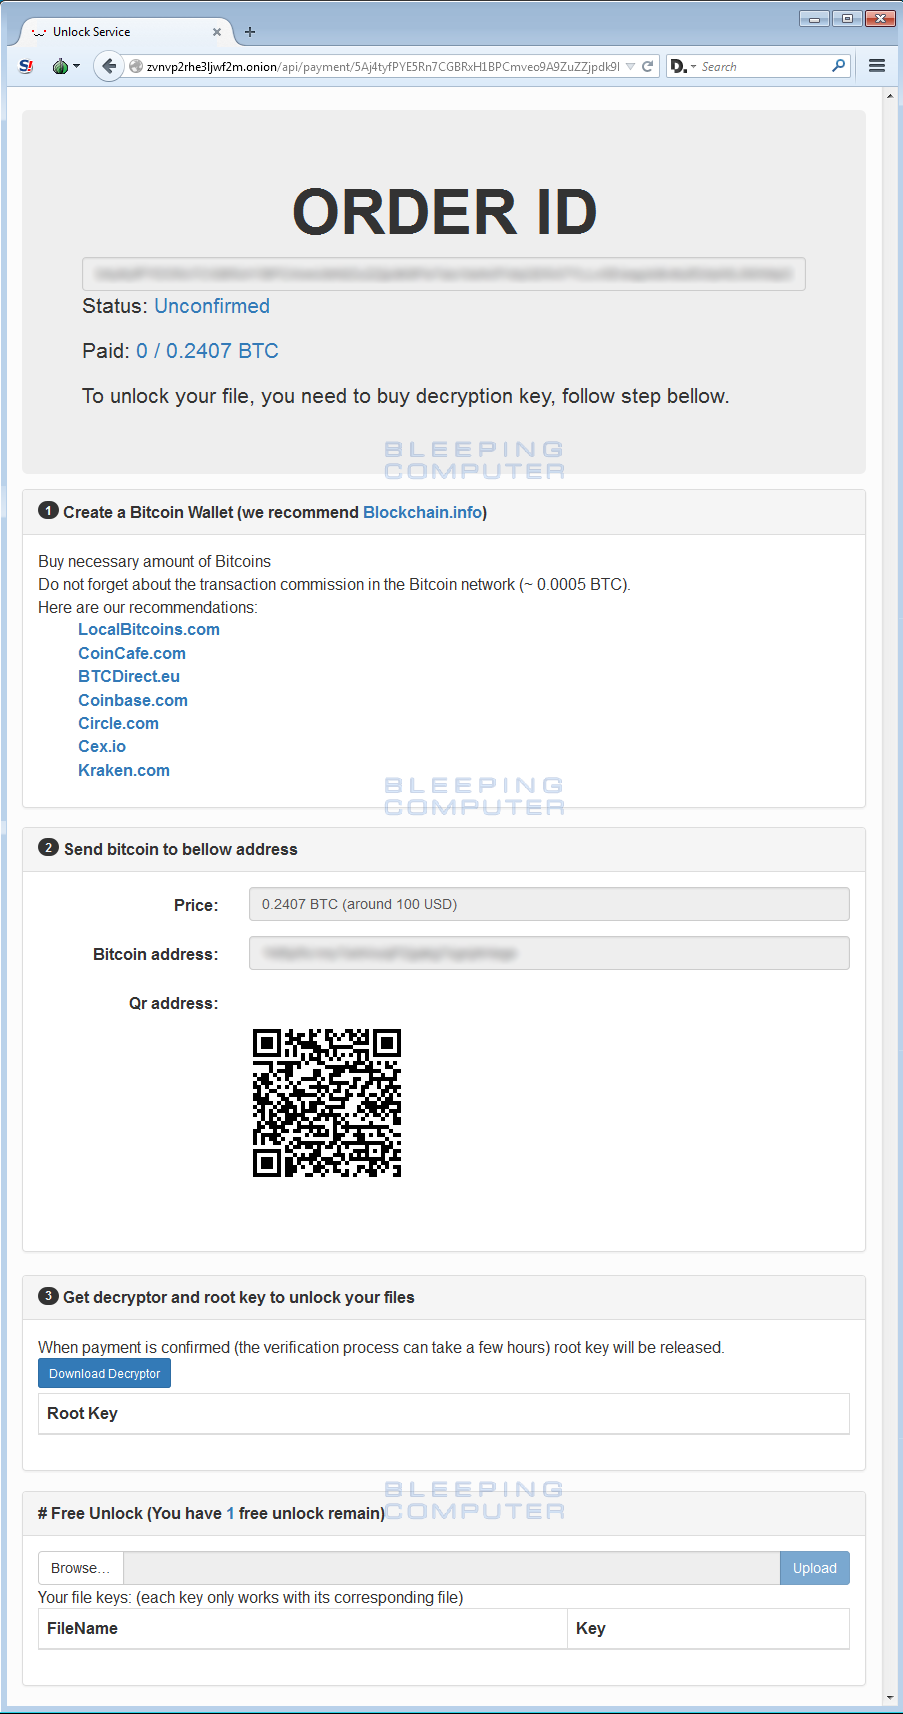 unlock-service-redacted.png